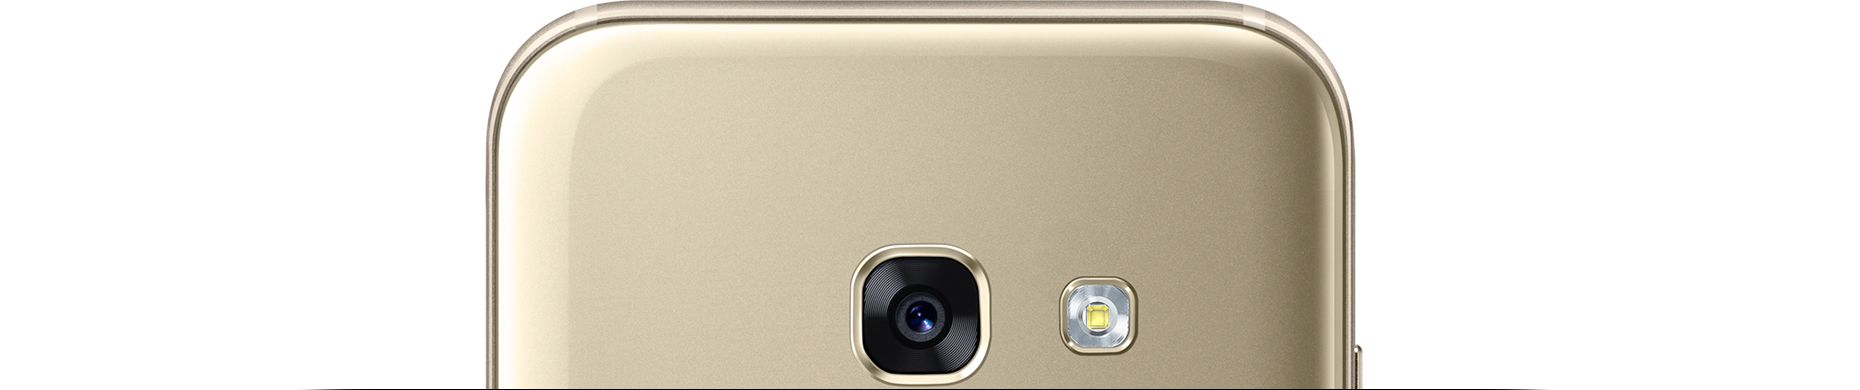 Samsung Galaxy A3 Gold Back Aparat